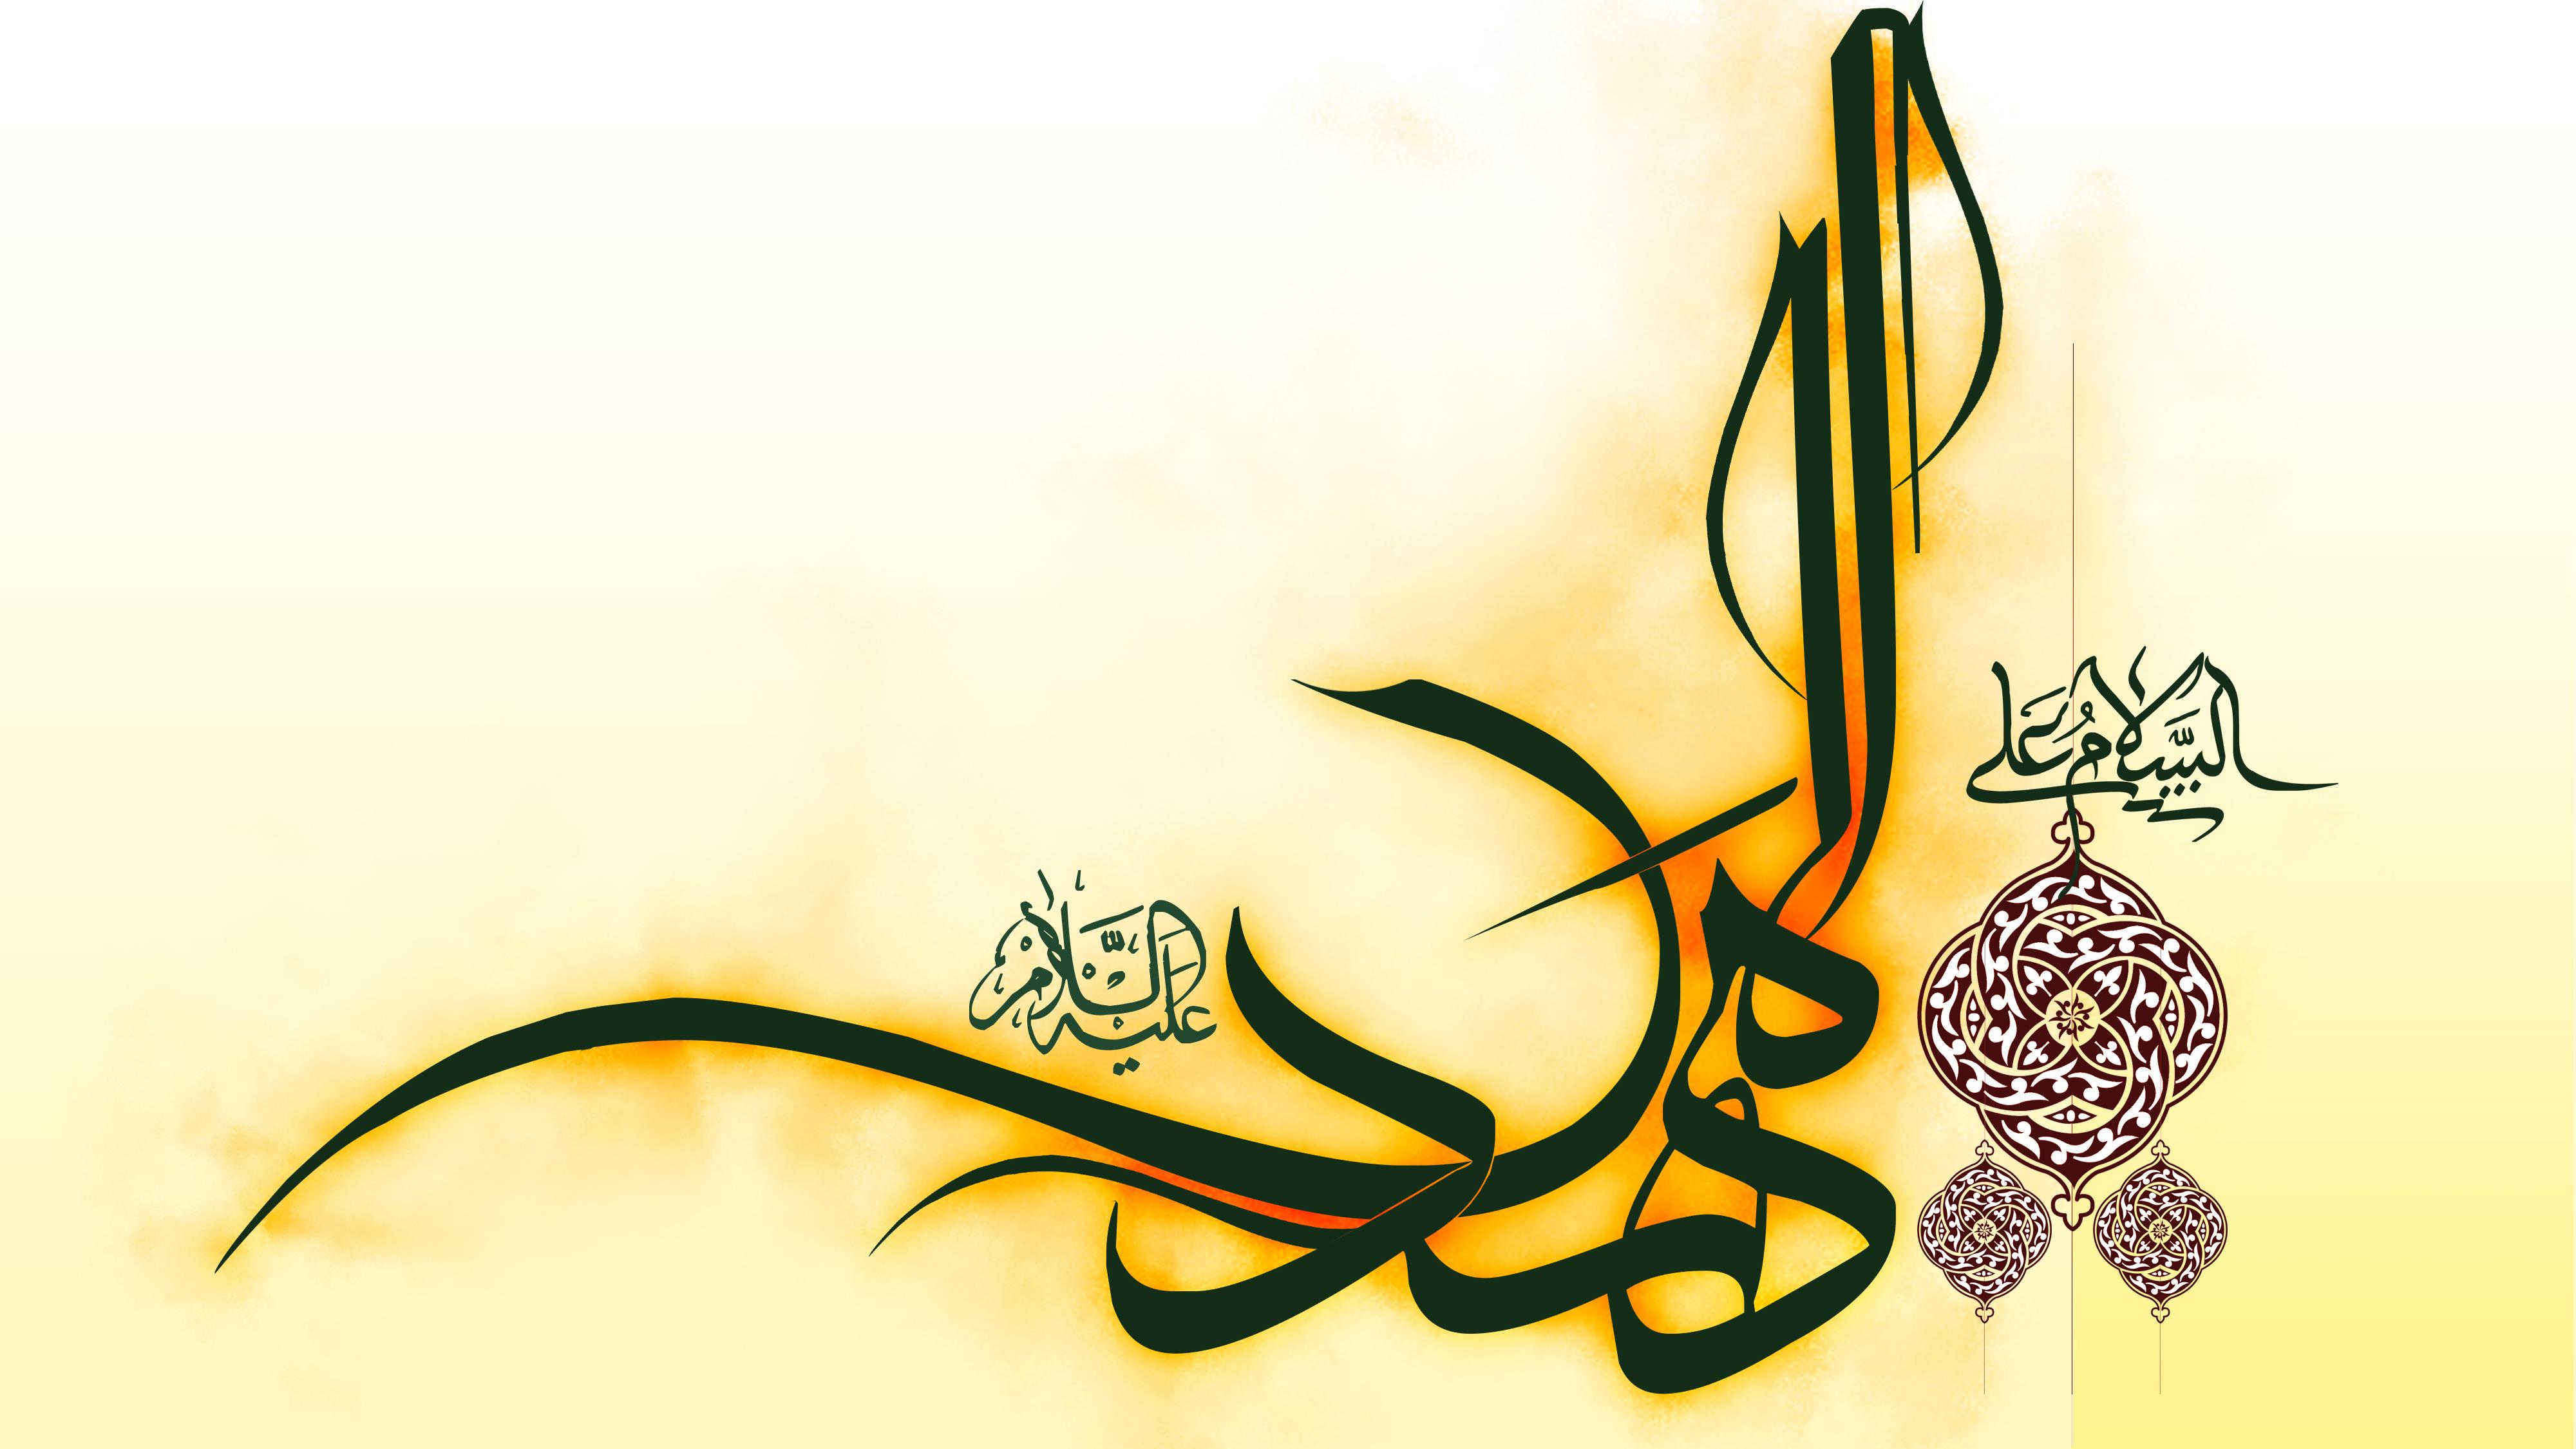 imam_mahdi_pbuh_by_ostadreza-2_www.yasinmedia.com